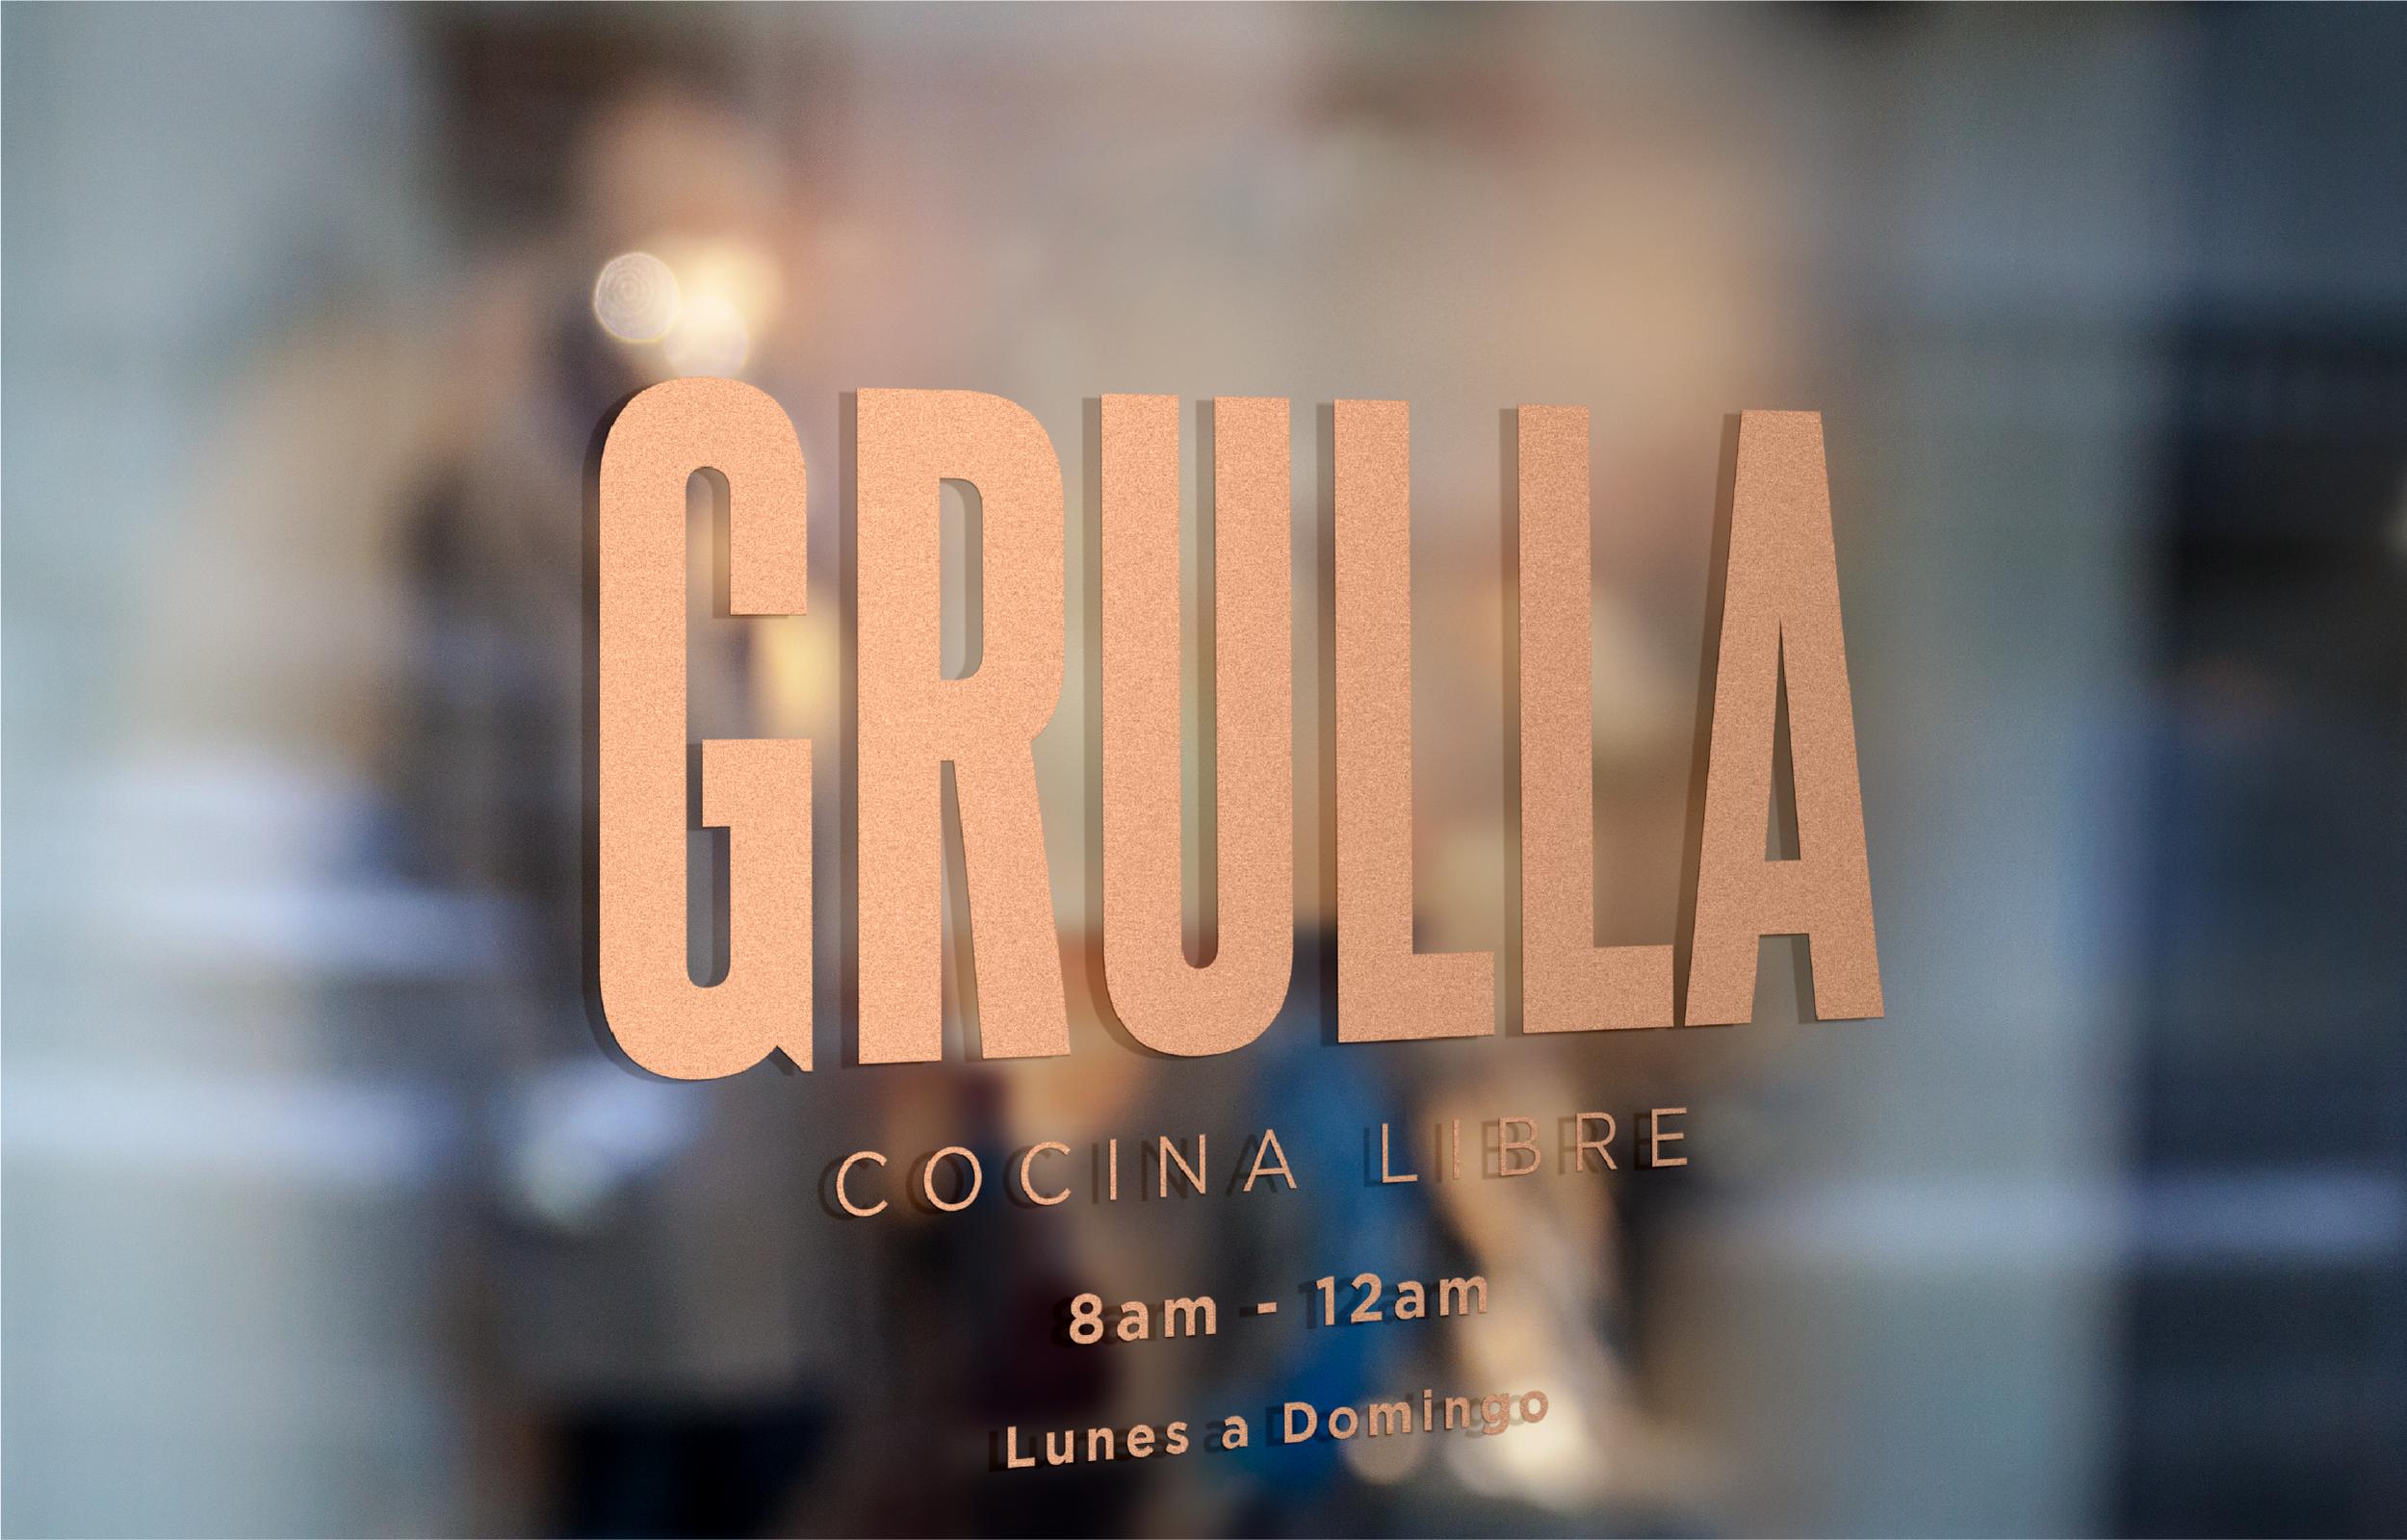 Grulla+Portafolio-15.png